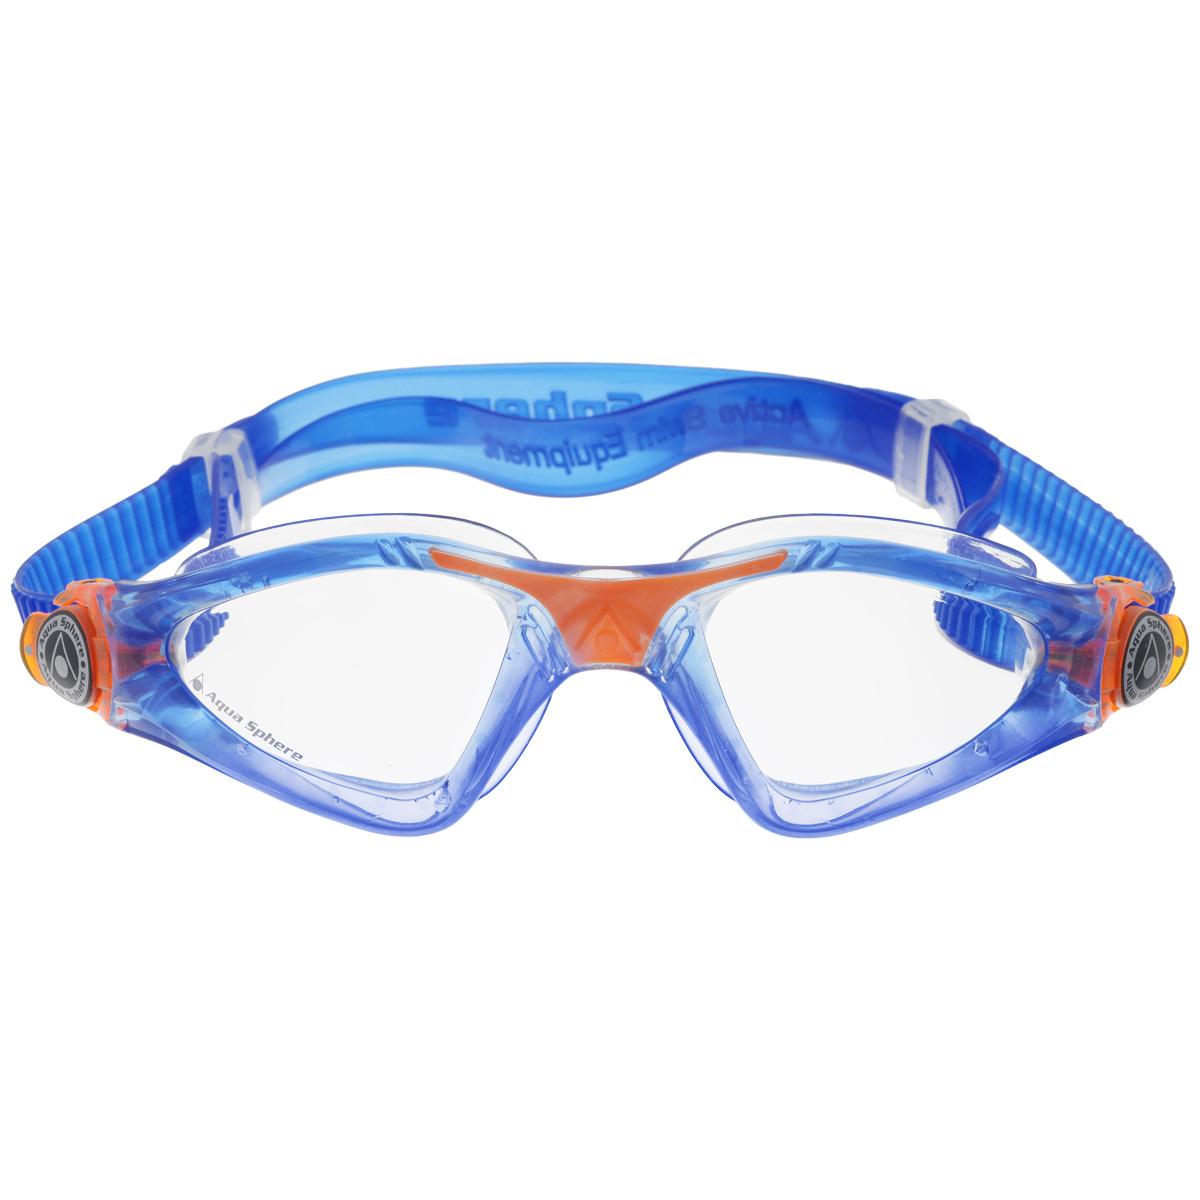 "Очки для плавания Aqua Sphere ""Kayenne Junior"", цвет: синий, оранжевый  #1"